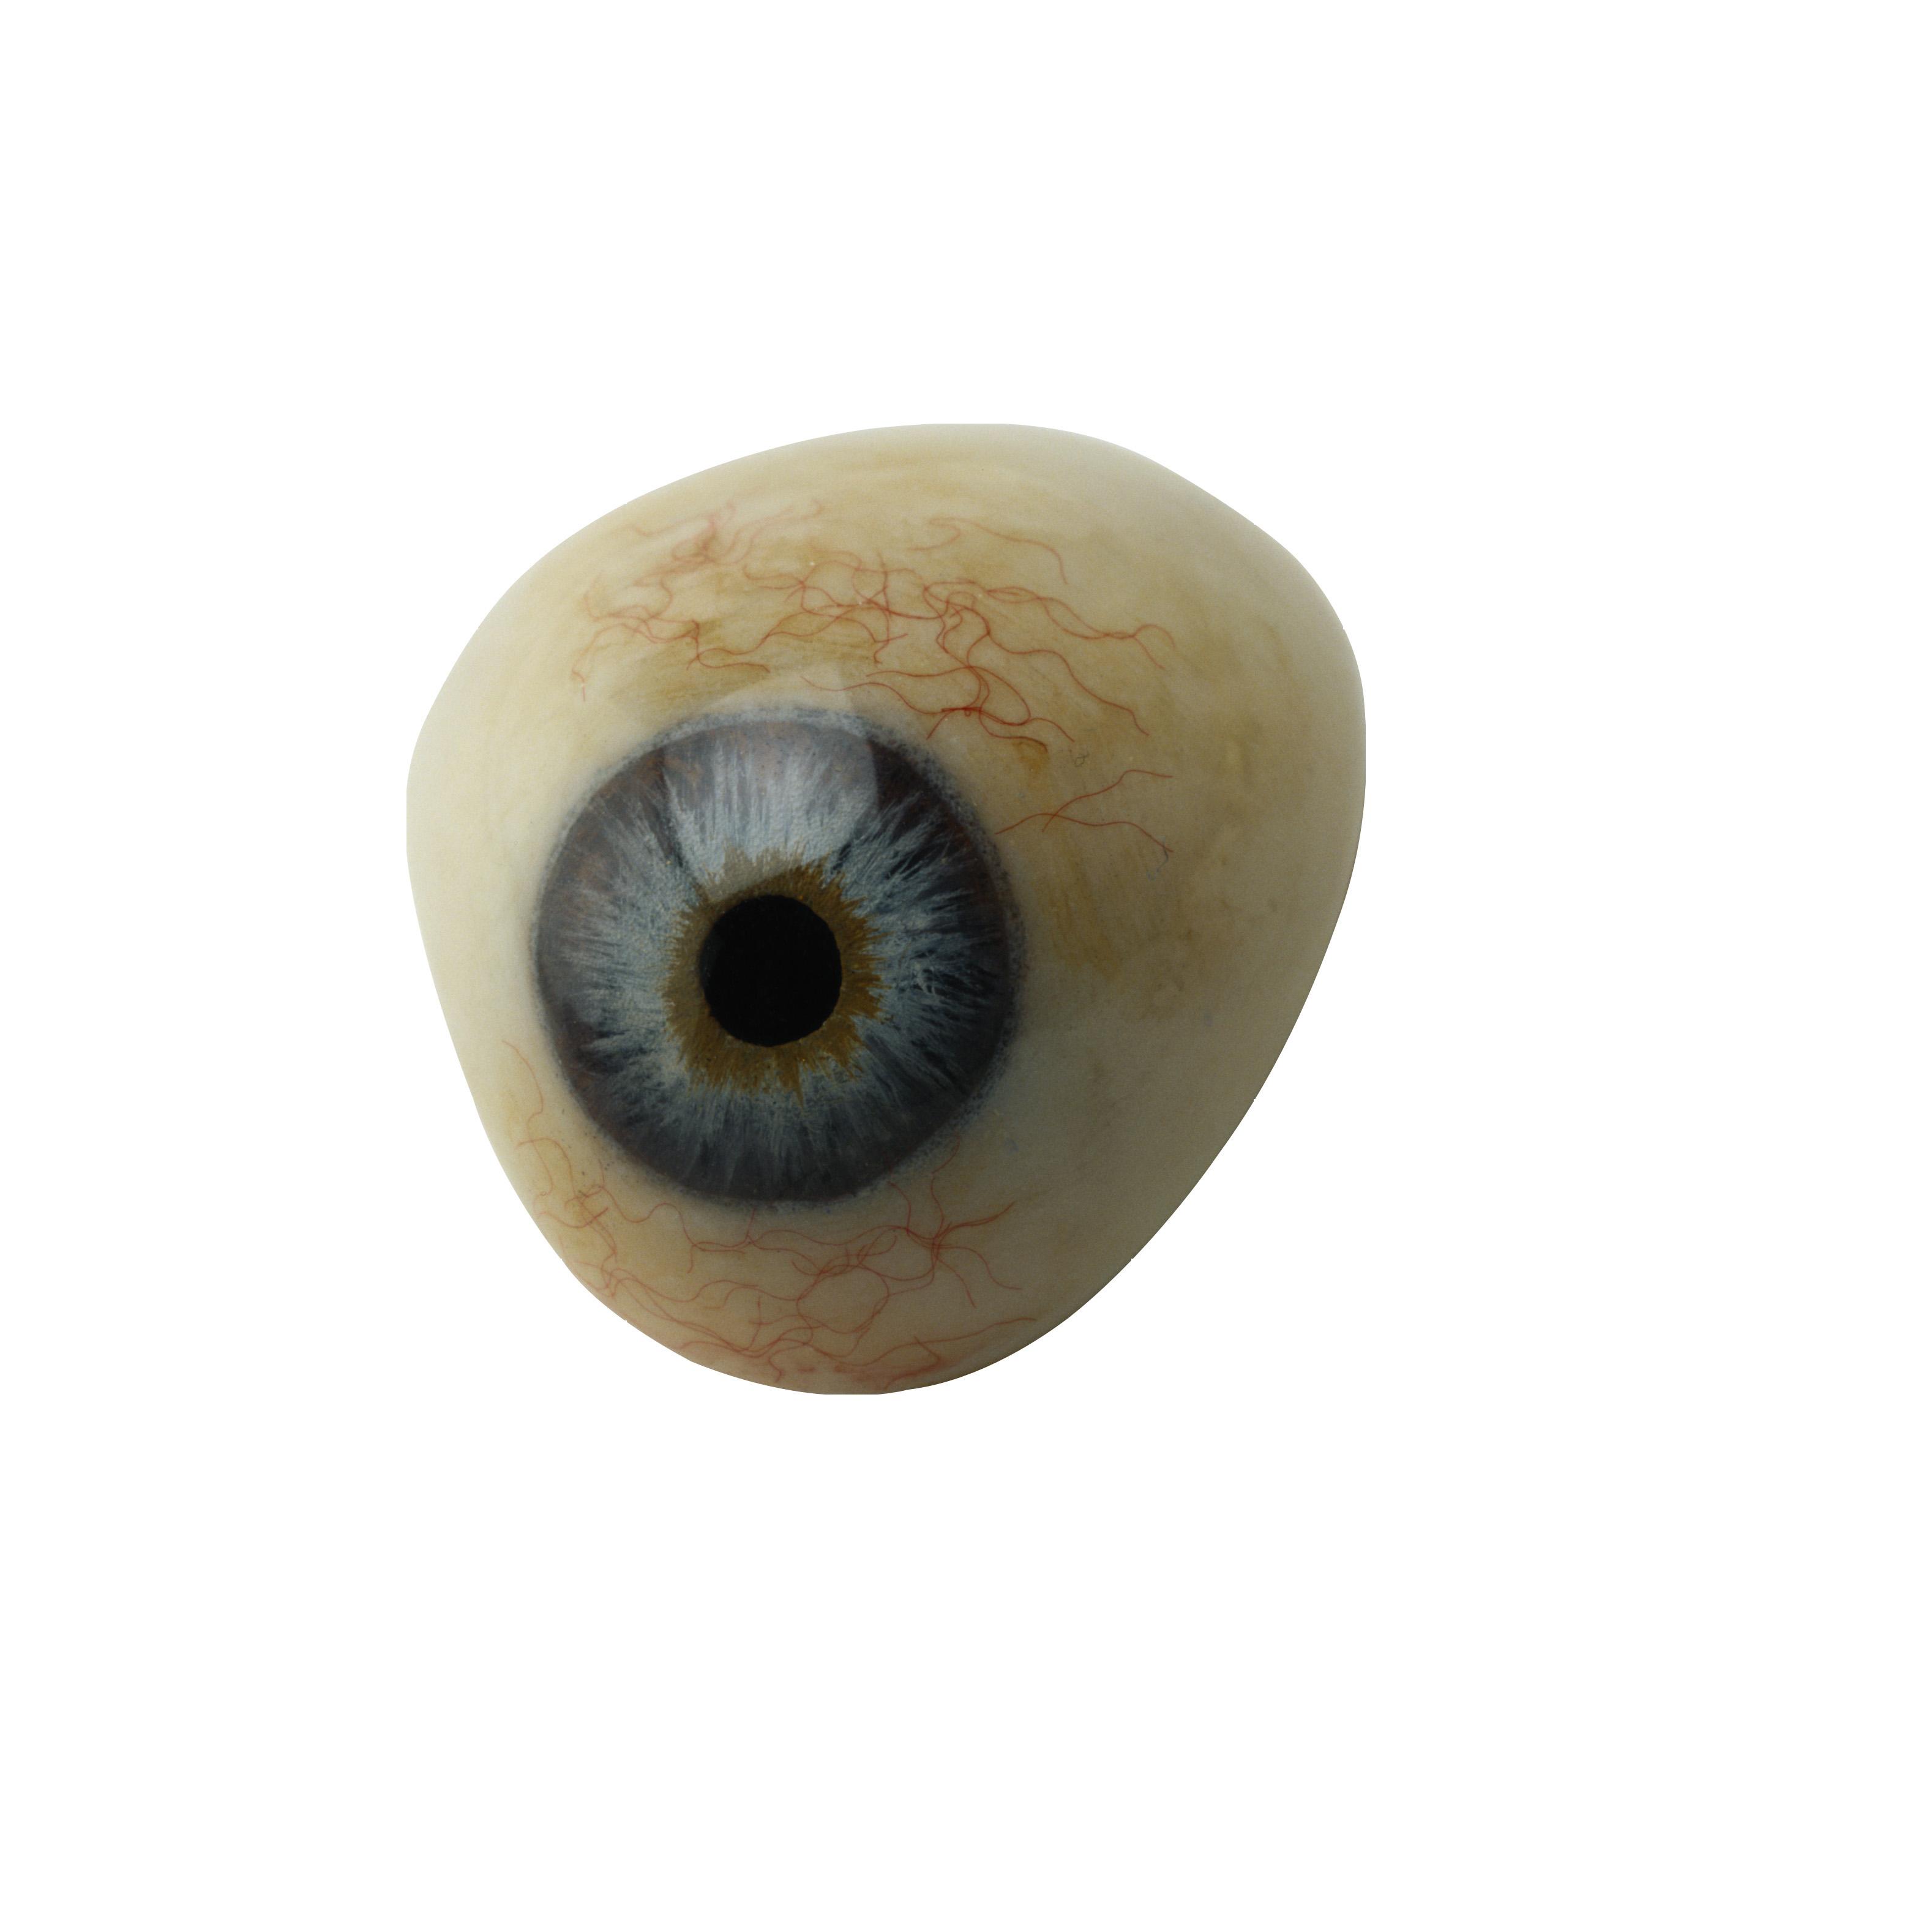 Eye Transparent Png By Absurdwordpreferred Deviantart Com On Deviantart Creepy Eyes Cartoon Girl Eyes Light Background Images